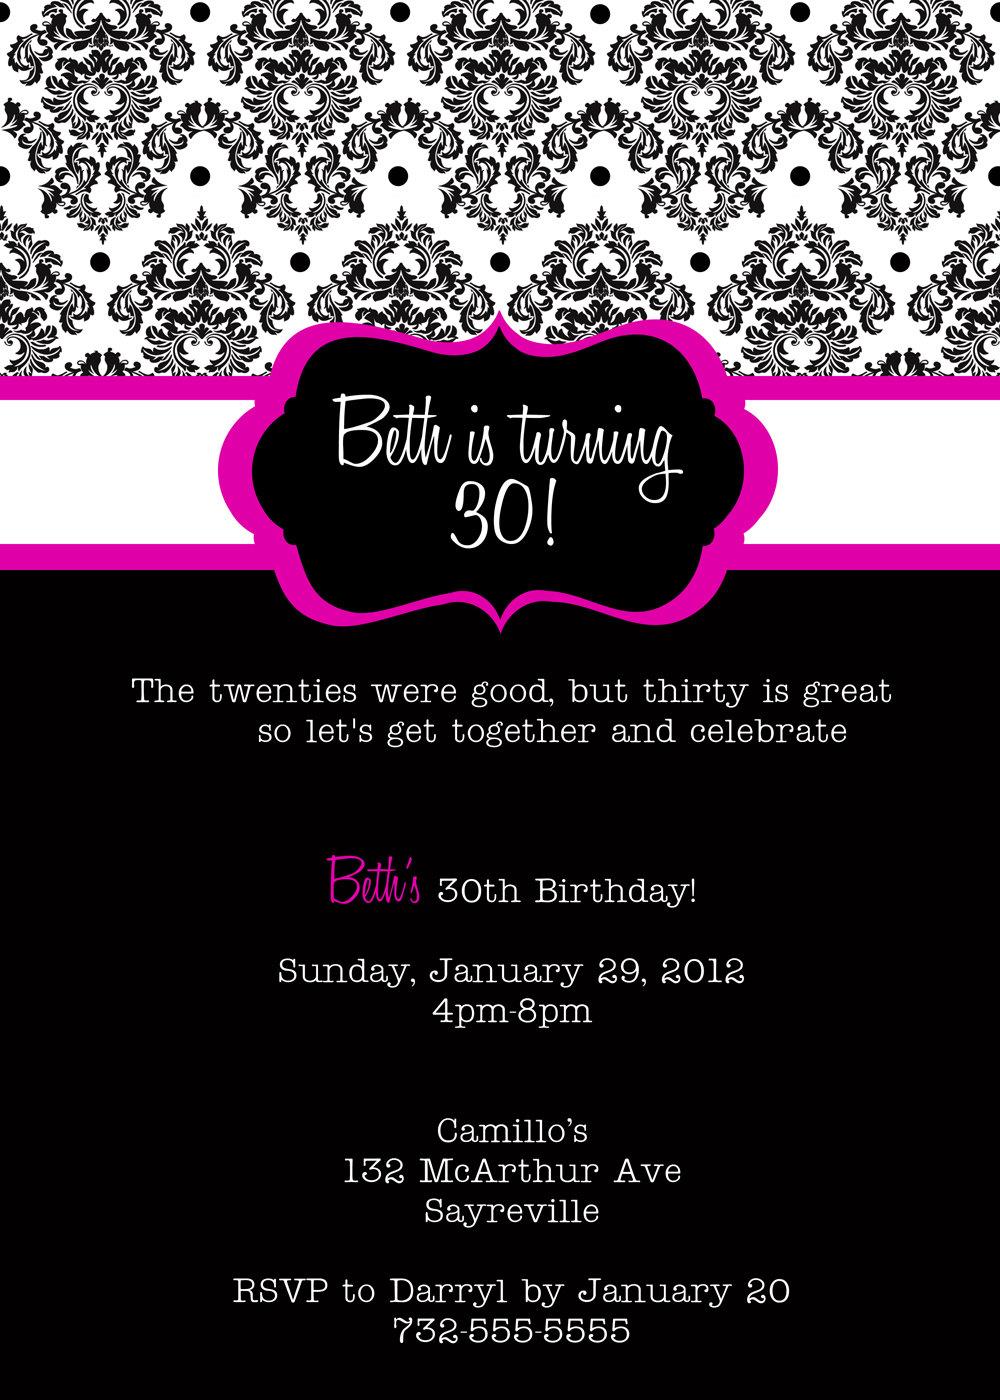 Free 30th Birthday Party Invitations Templates